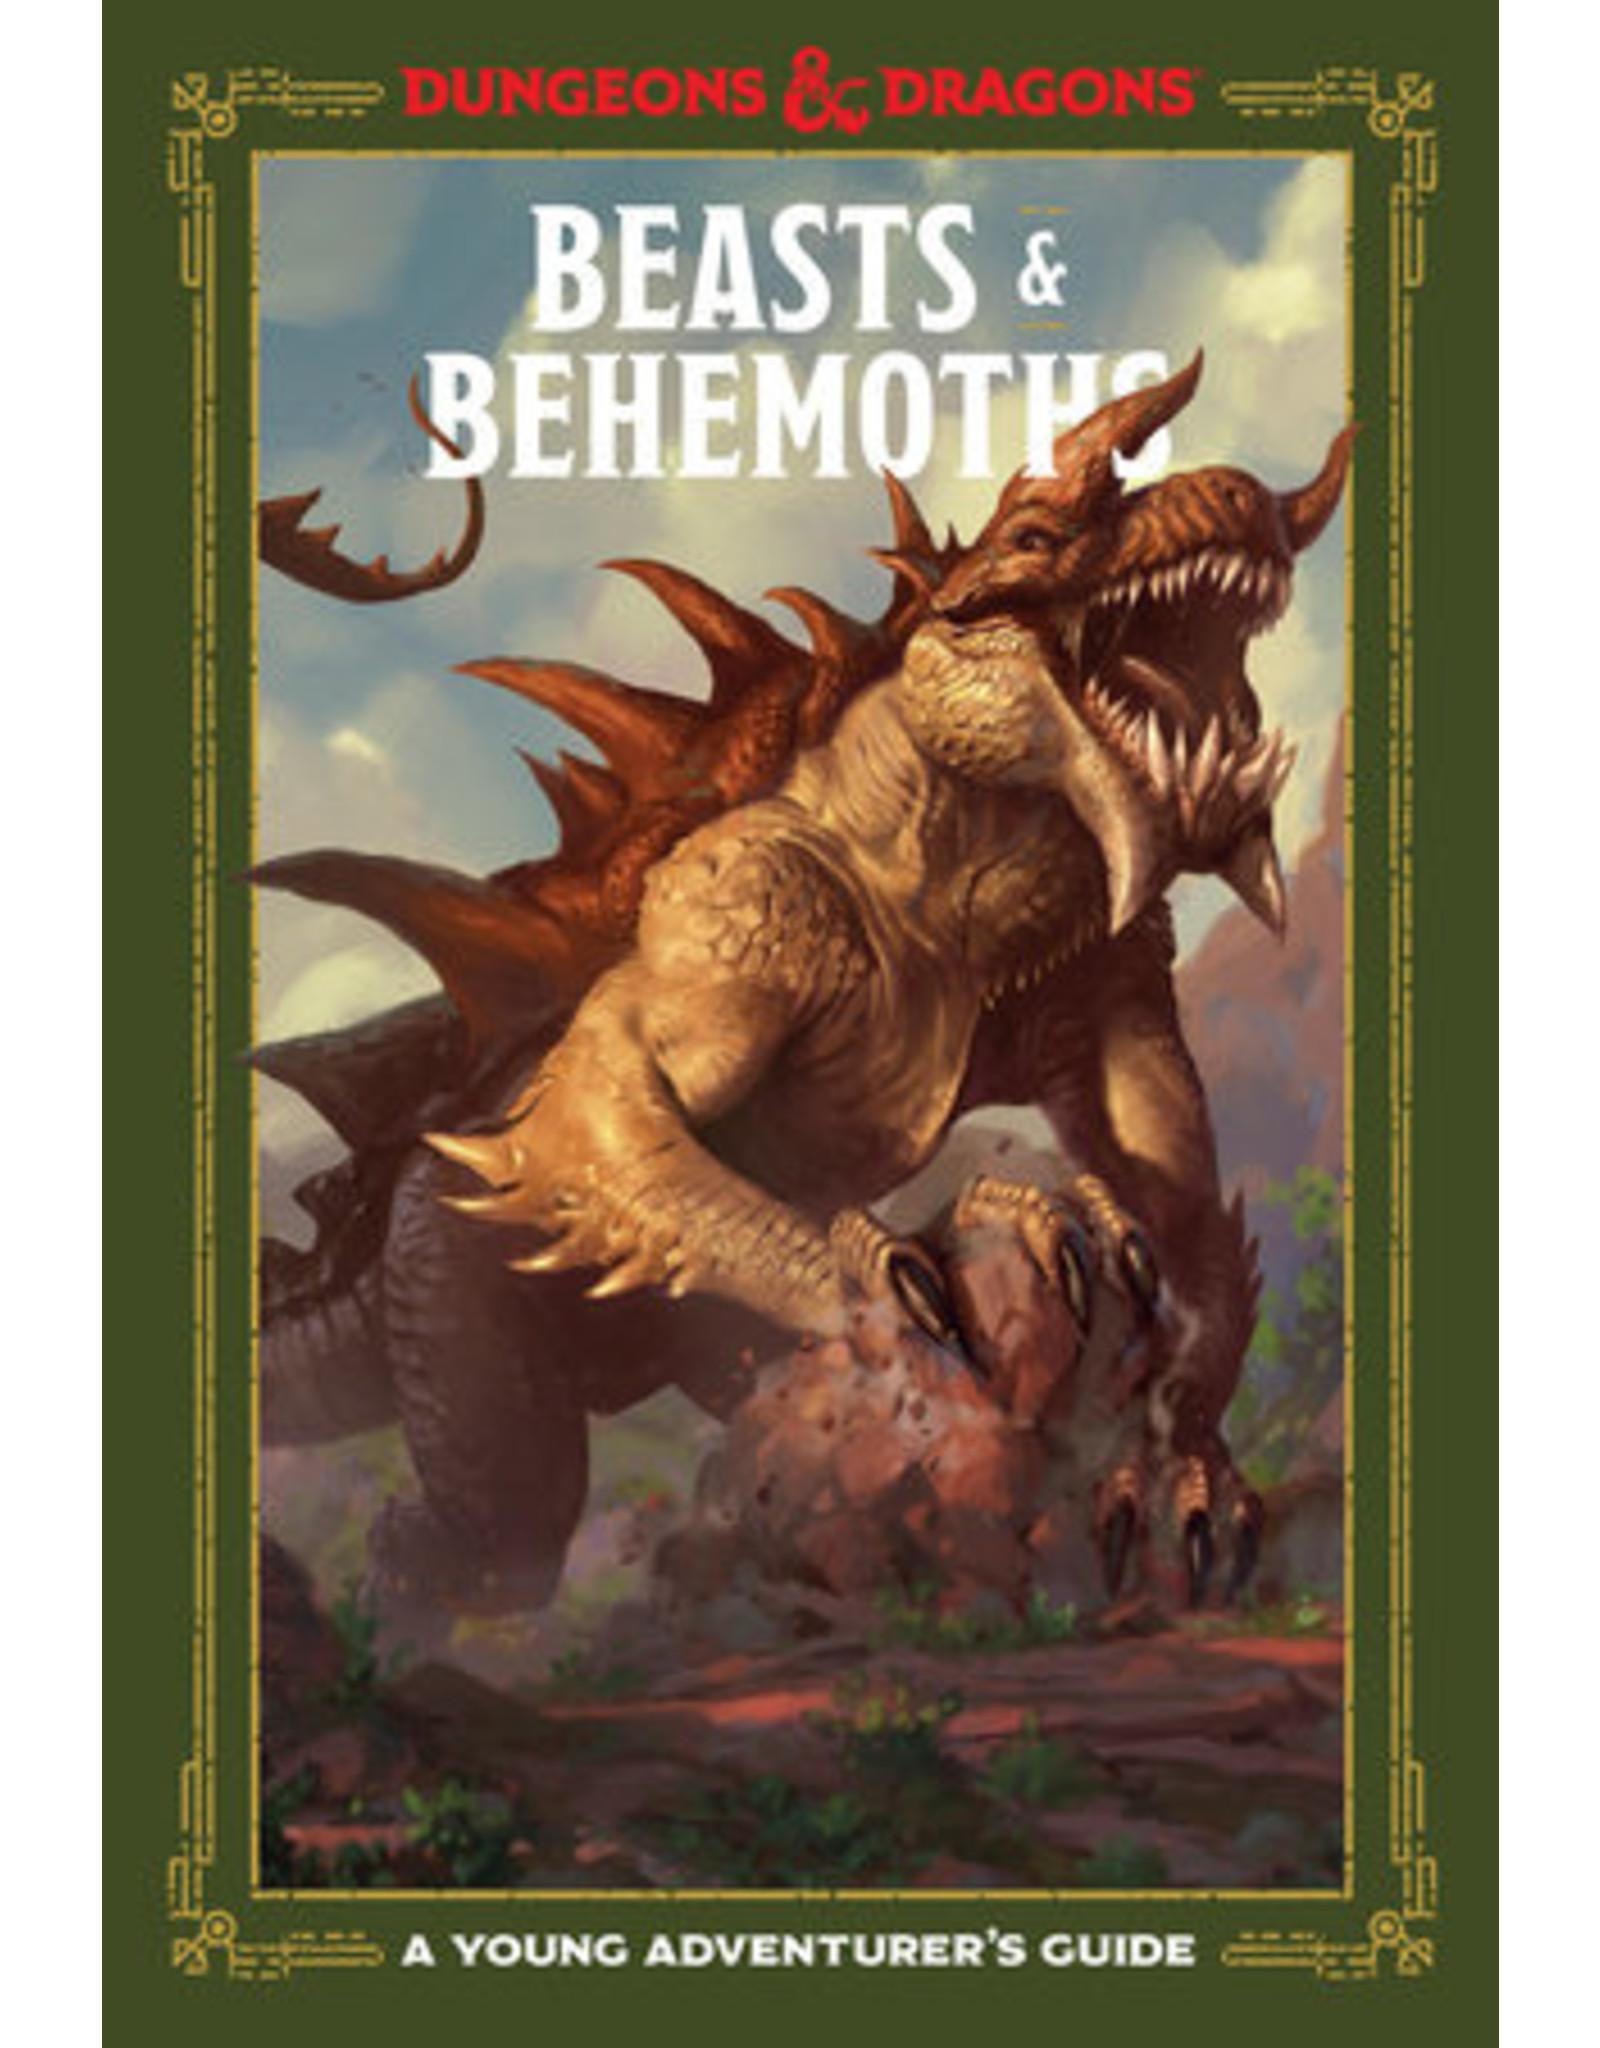 Random House Beasts & Behemoths (Dungeons & Dragons)